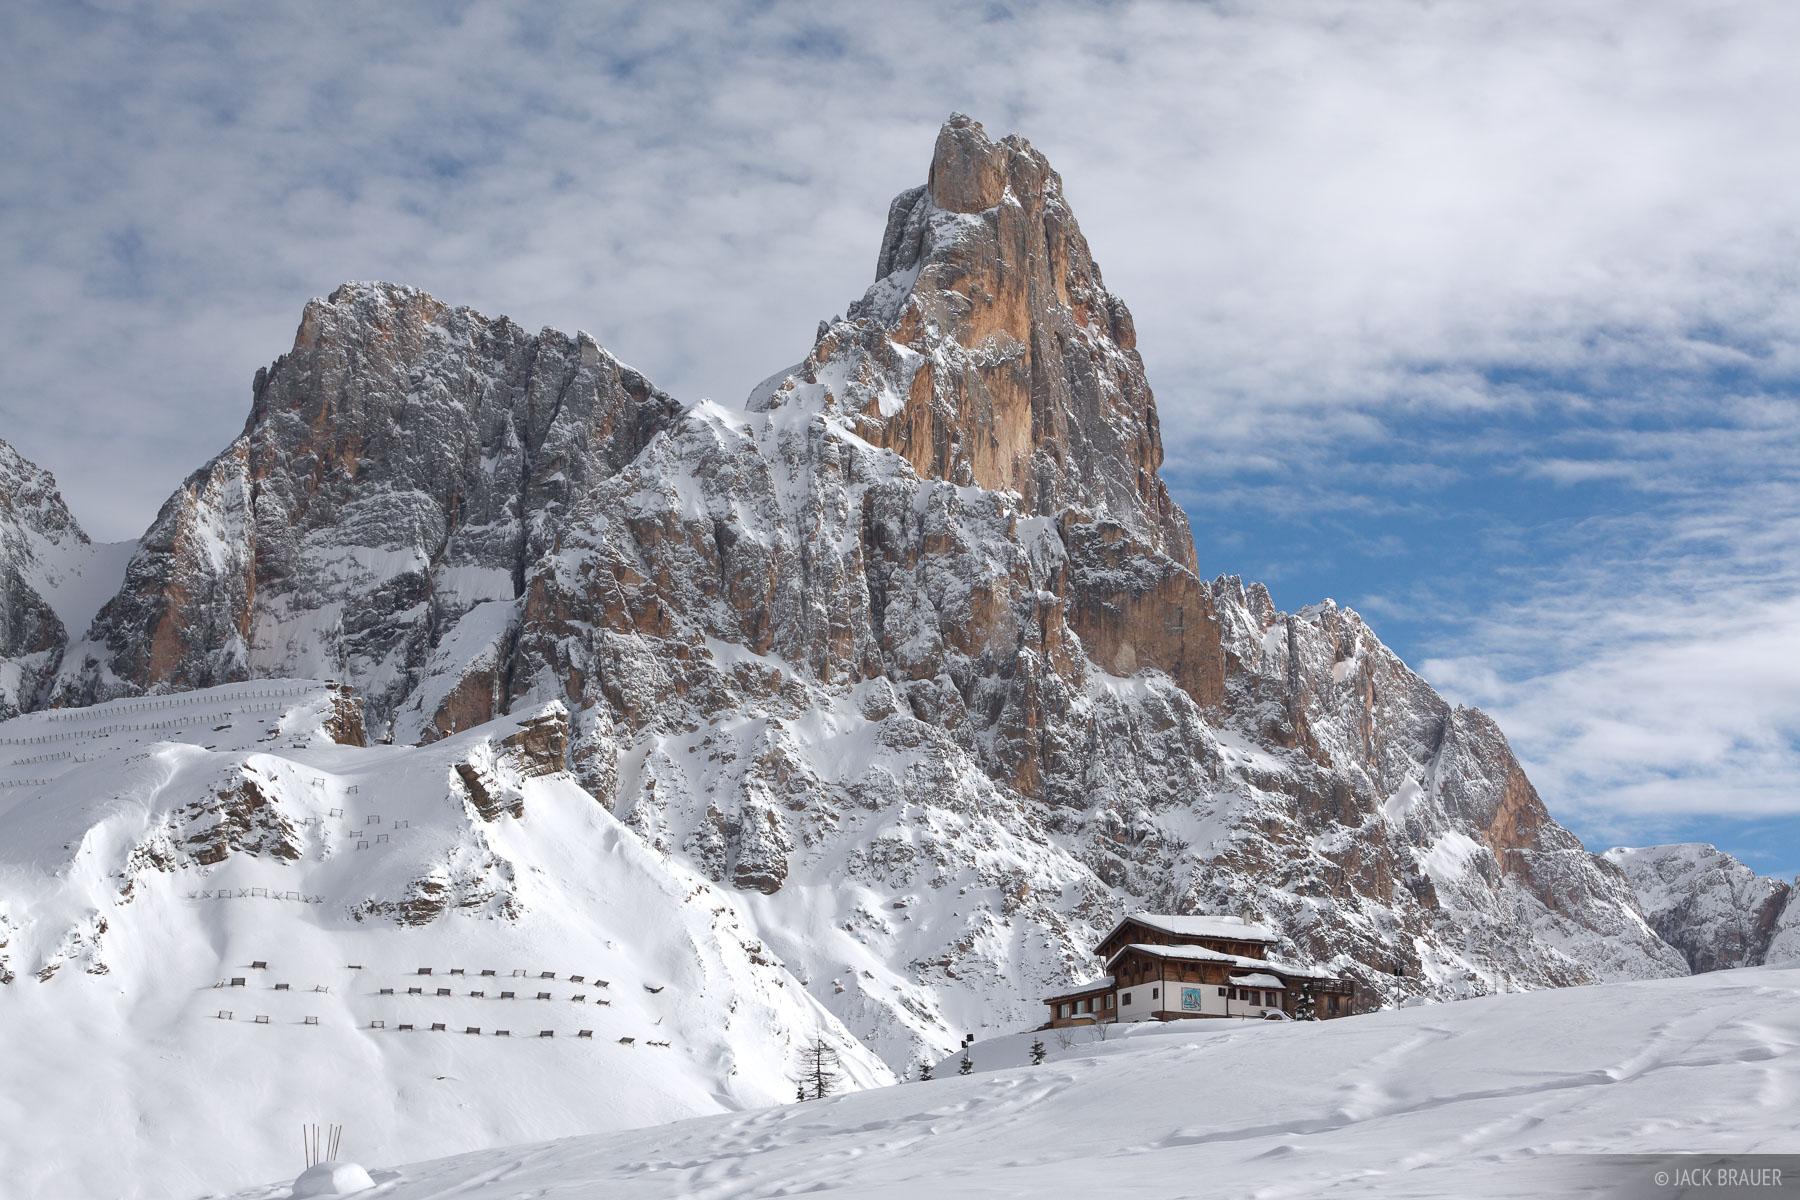 Cimon della Pala, Dolomites,Europe,Italy,San Martino, Passo Rolle, photo